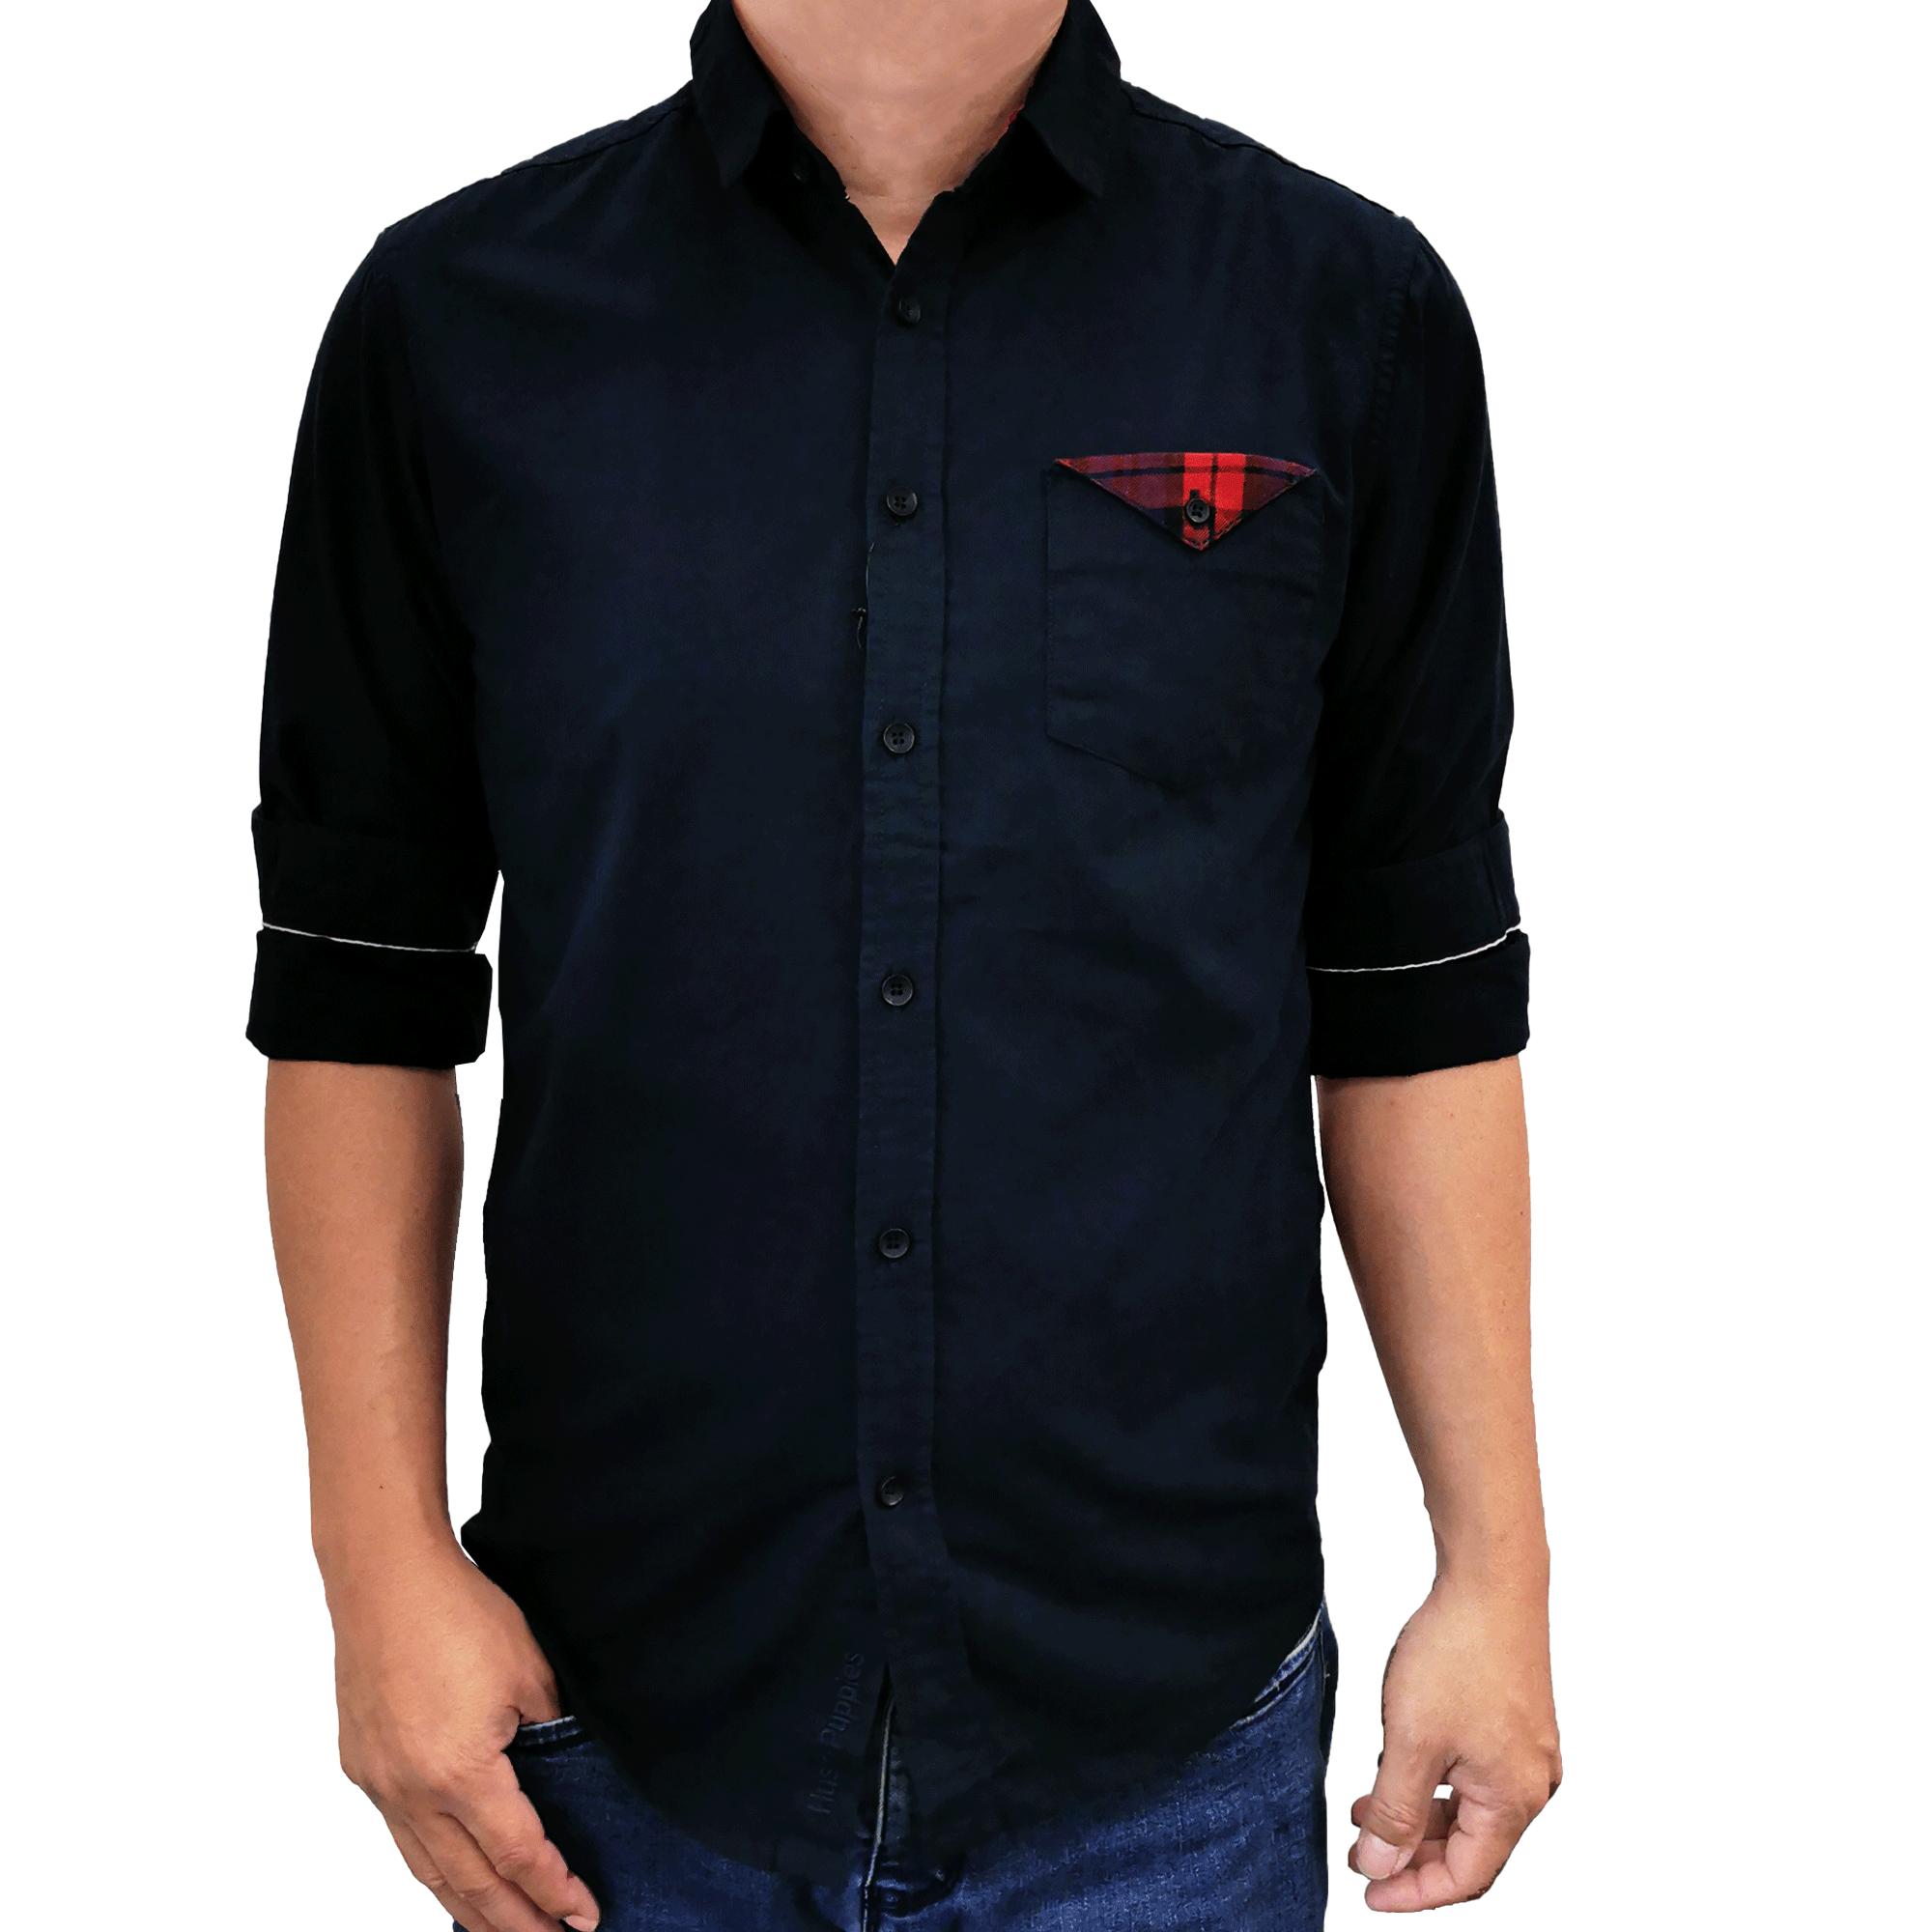 Hush Puppies-Cole Long Sleeve Shirt  HMW773997